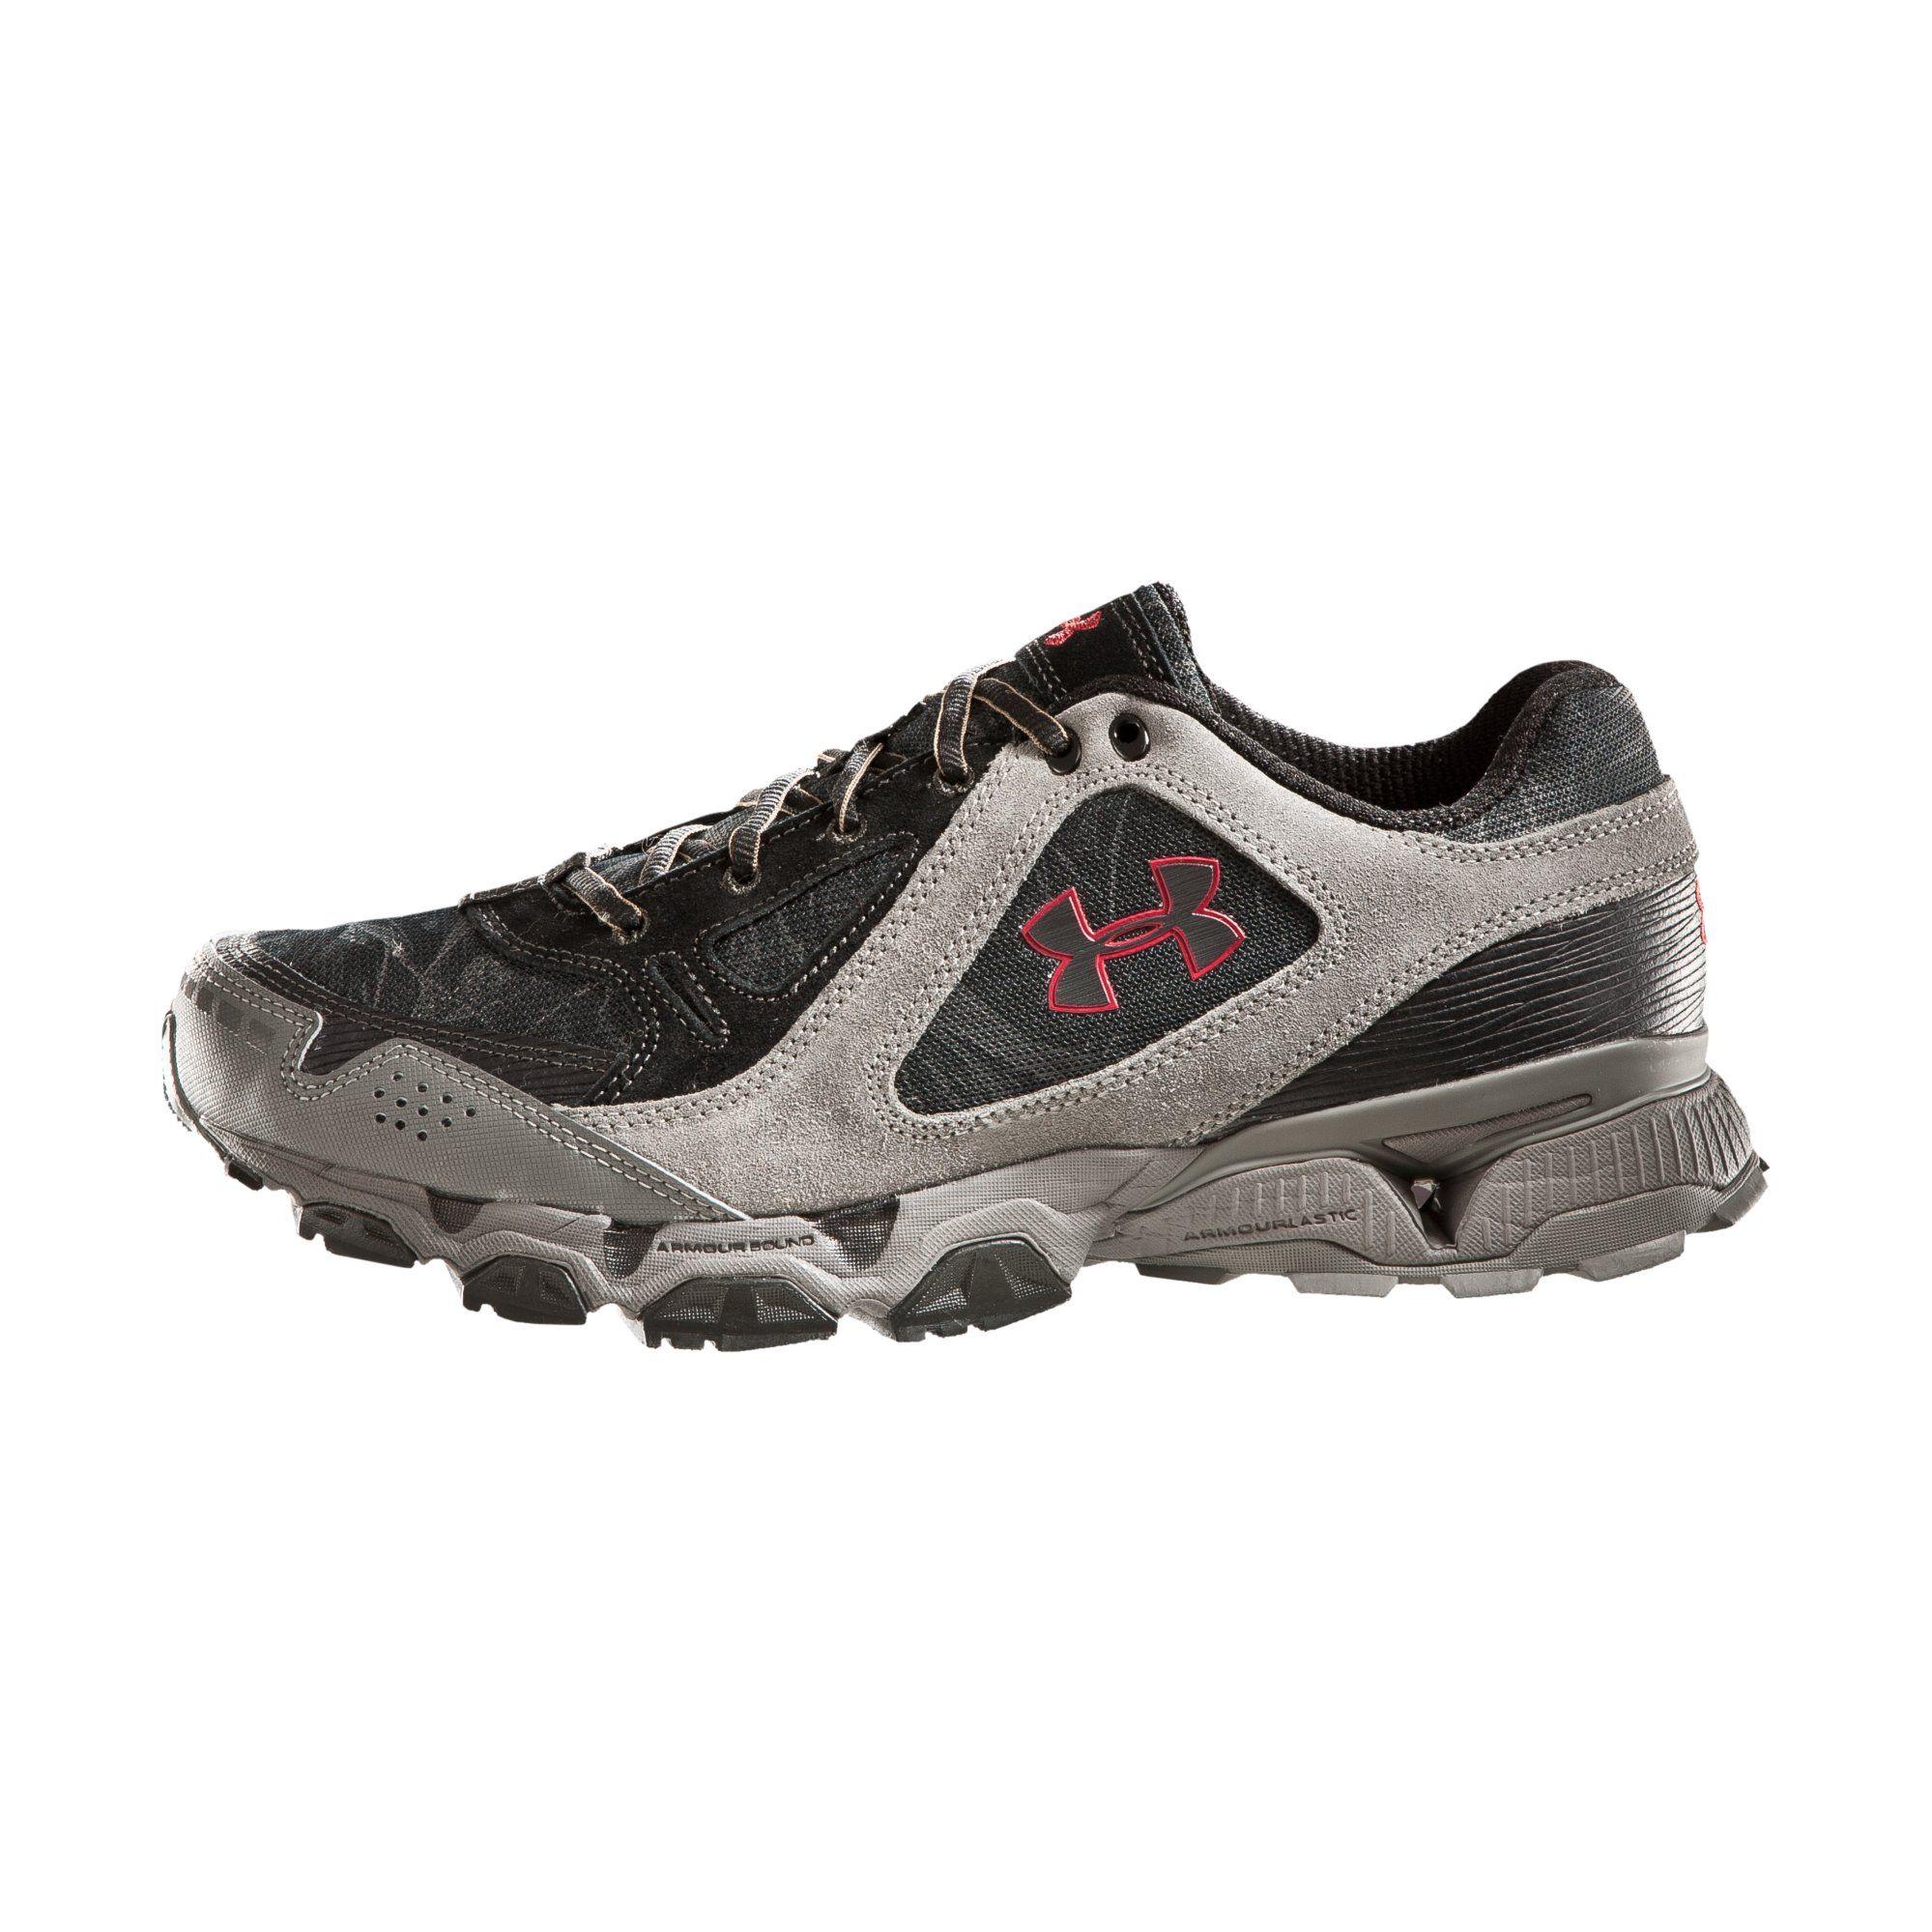 crédito Creta entrega  Under Armour Men's Chetco II Trail Running Shoes | Running shoes for men, Trail  running shoes, Runing shoes